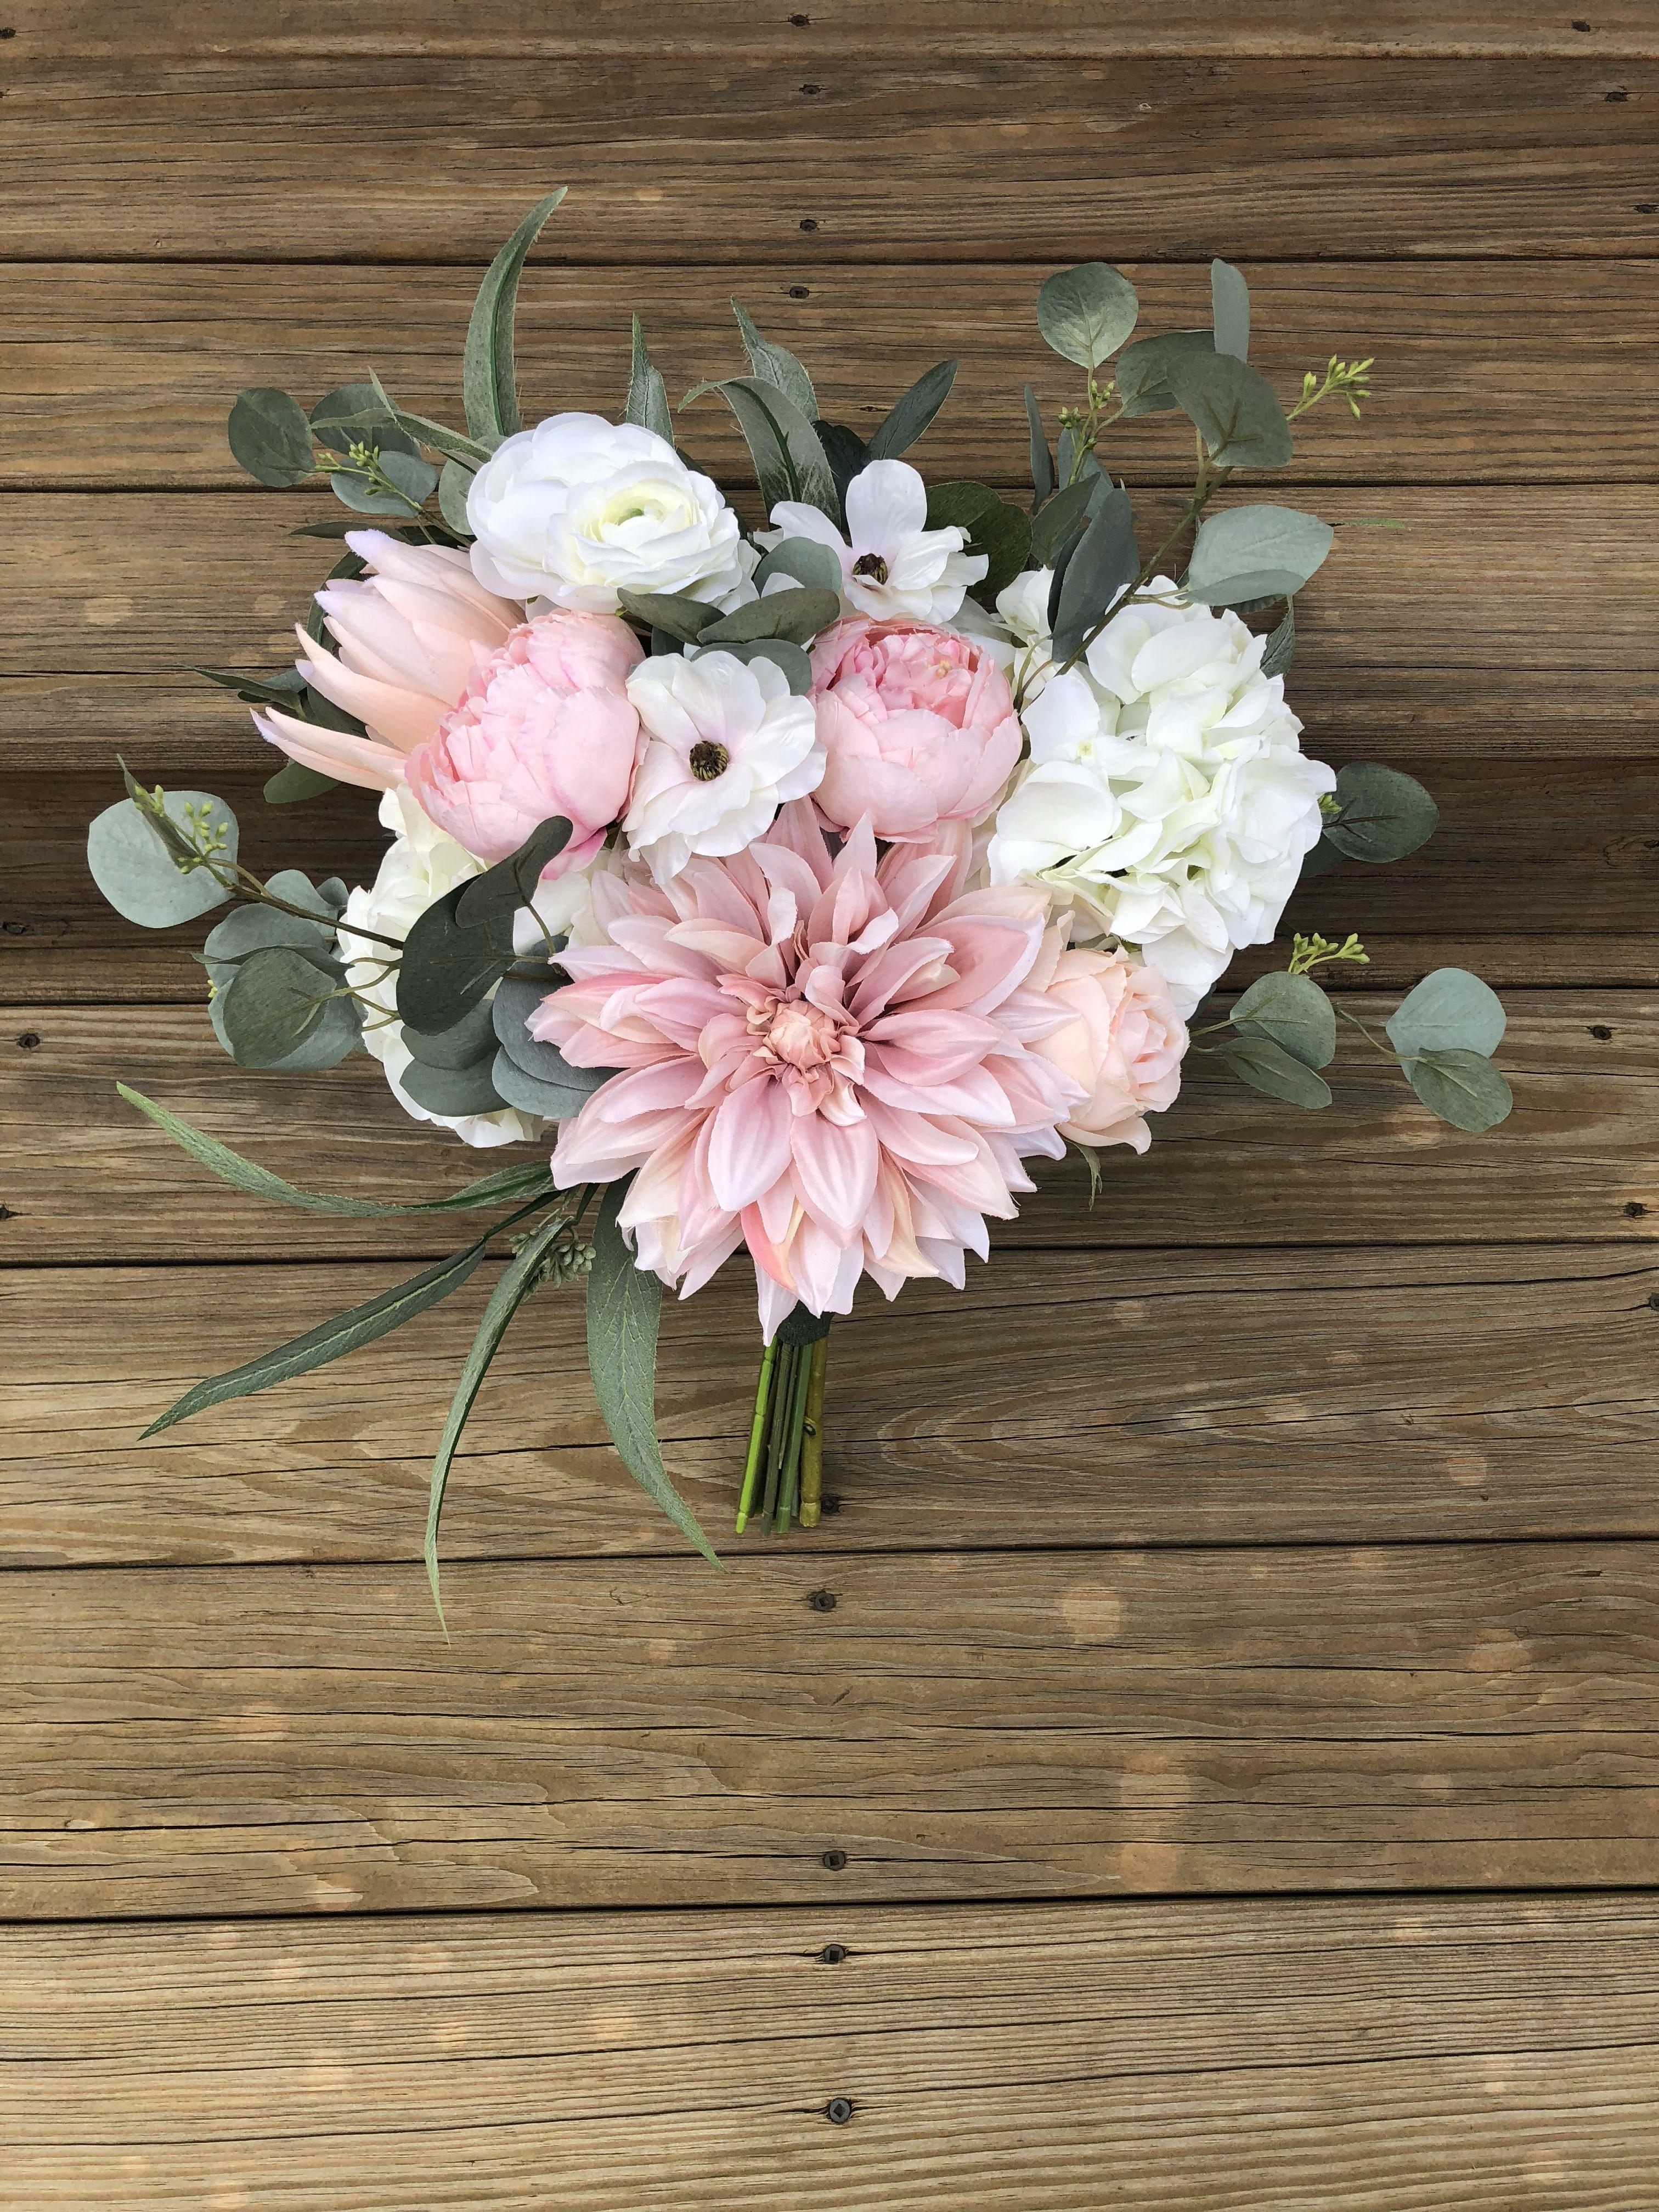 Pink Dahlia Peony Silk Bouquet Hochzeitsgestecke Rosa Pfingstrosen Bouquet Brautstrauss Rot